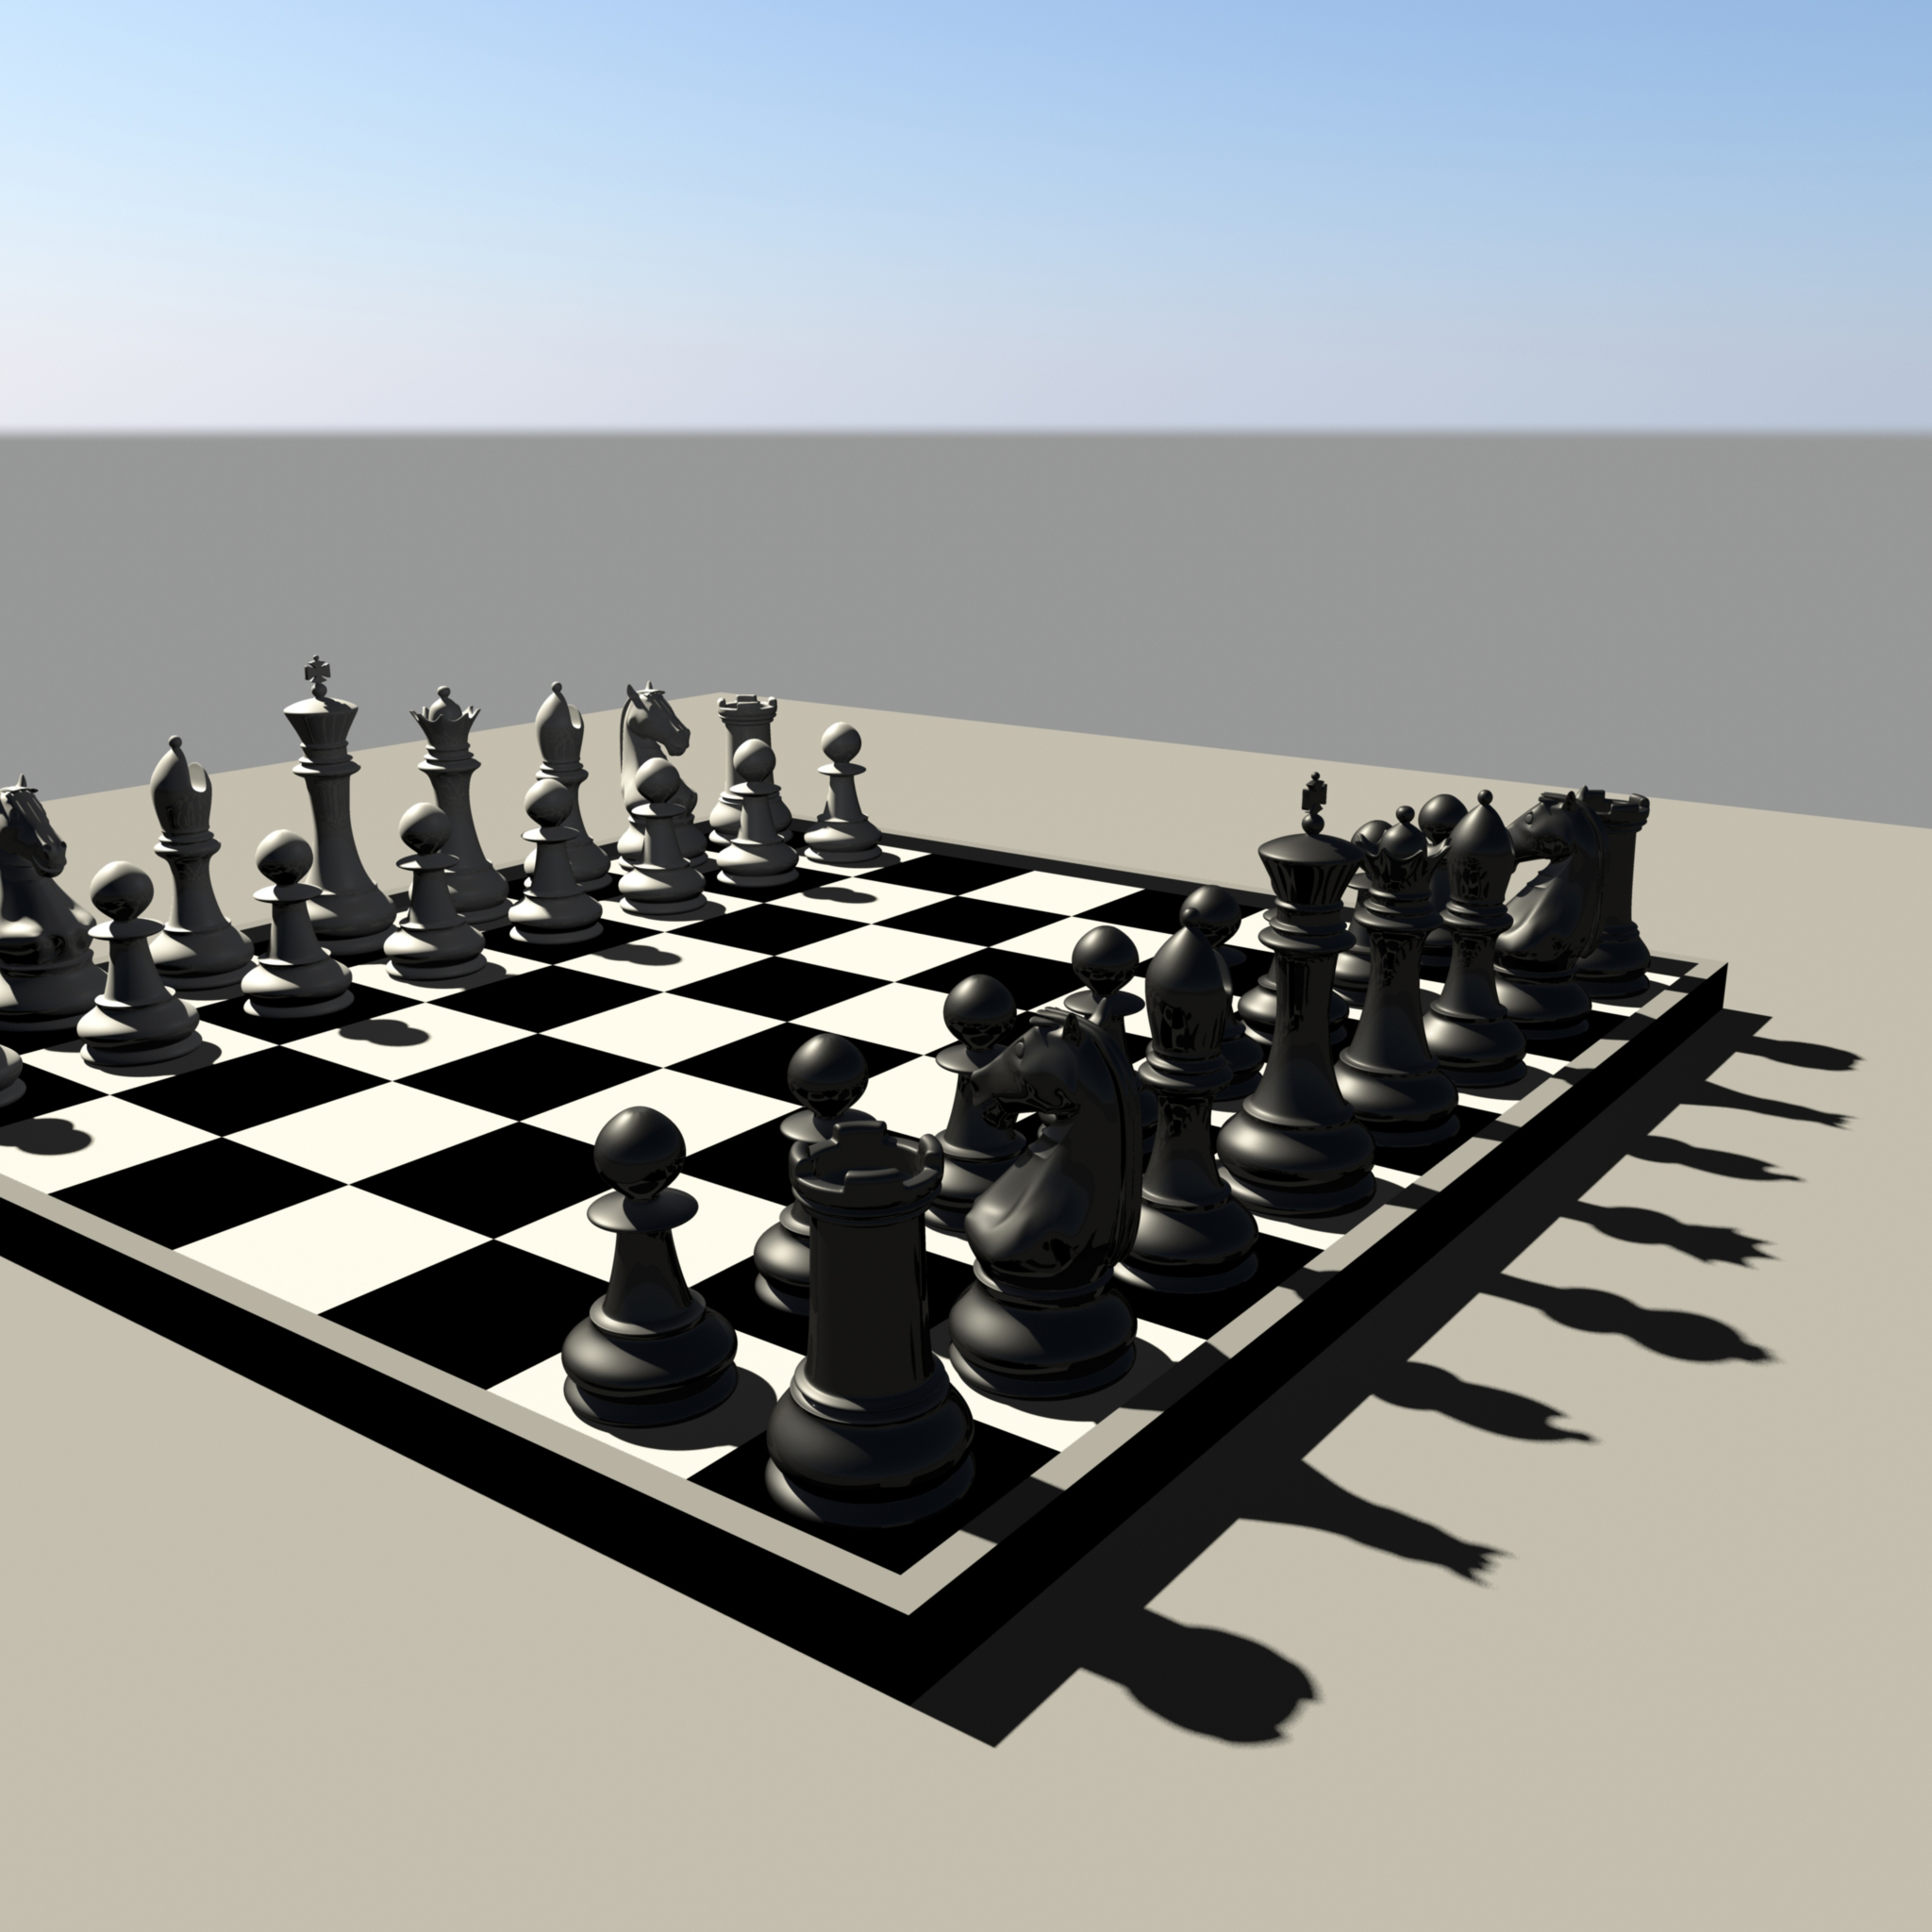 chess 3 3d model fbx ma mb obj 153547